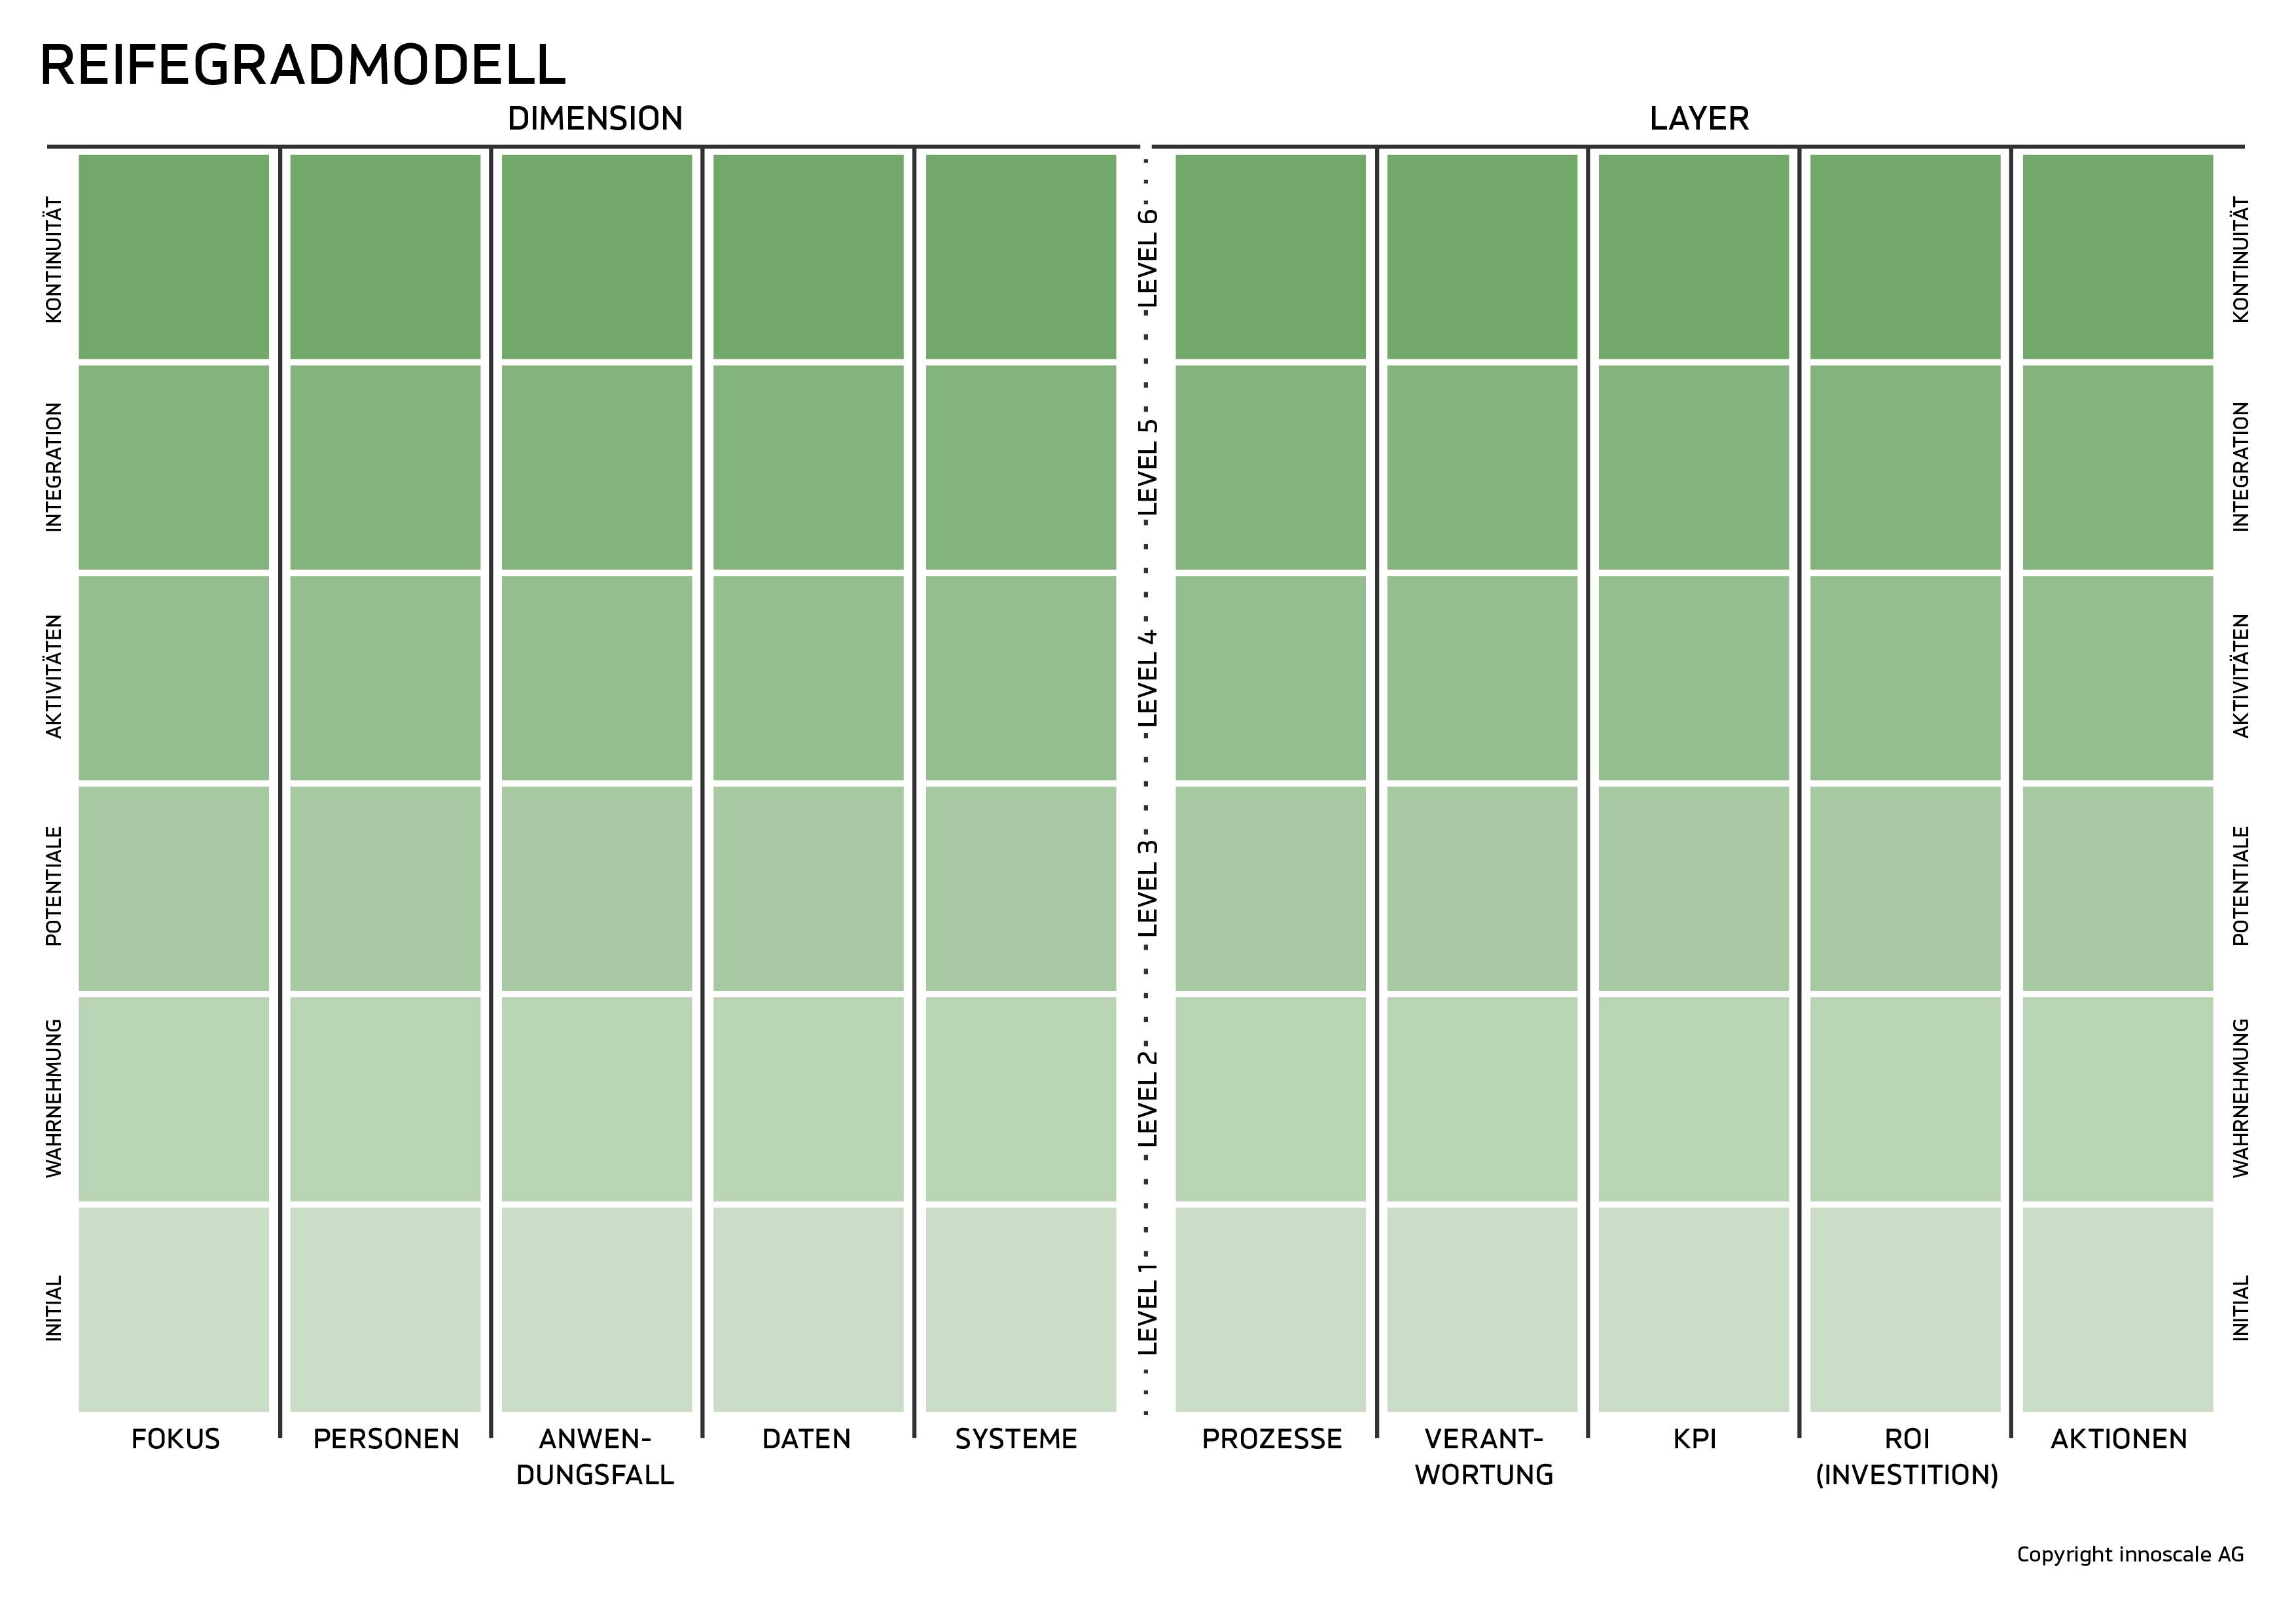 innoscale MDM3 Reifegradmodell